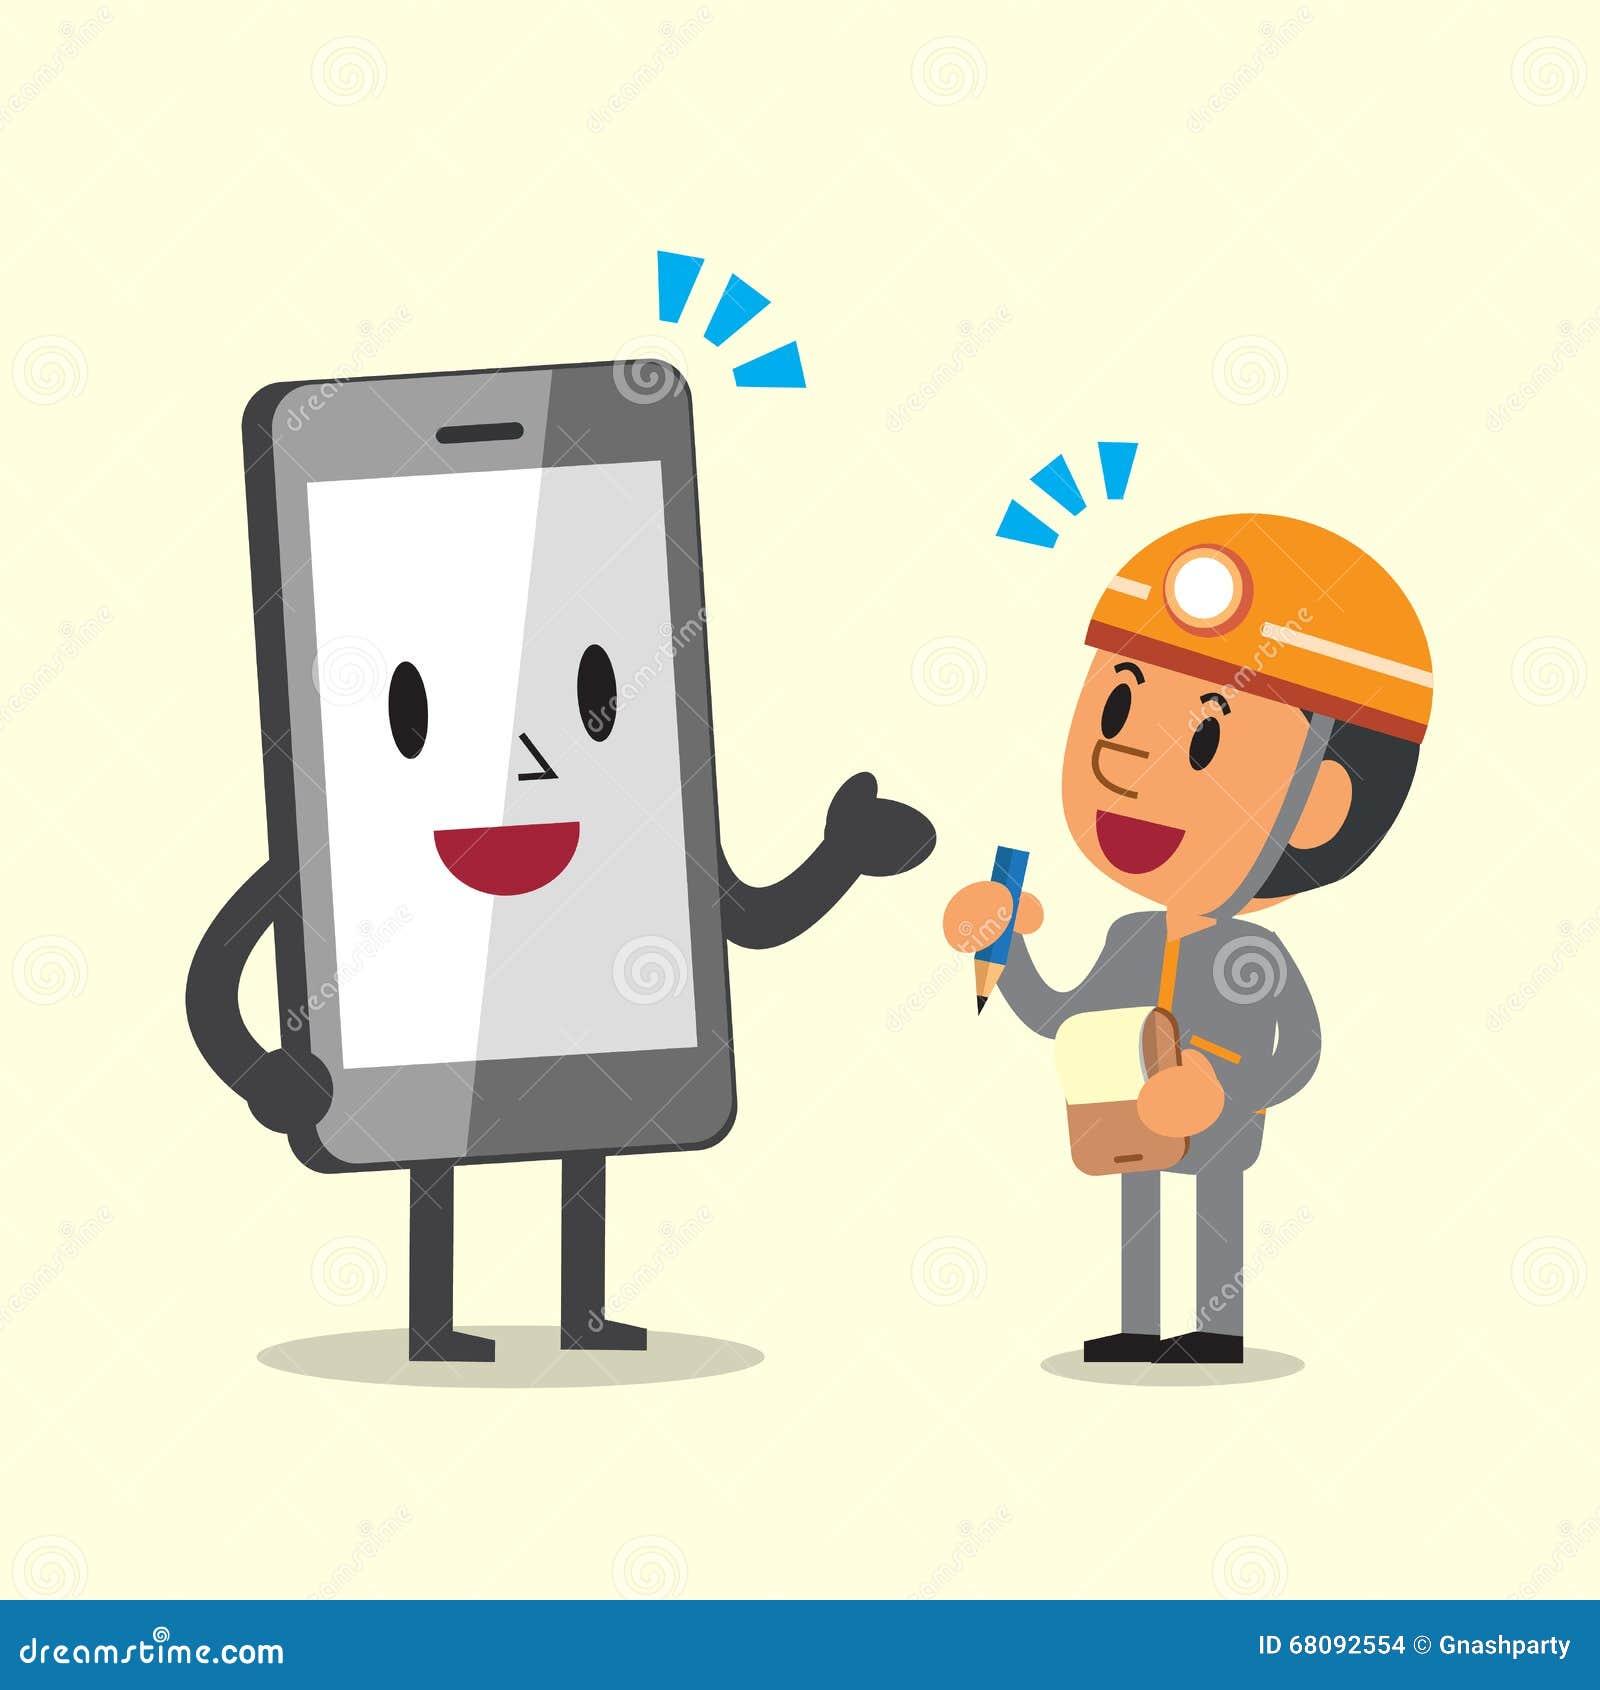 Cartoonsmart Character Design : Cartoon technician and smartphone character stock vector